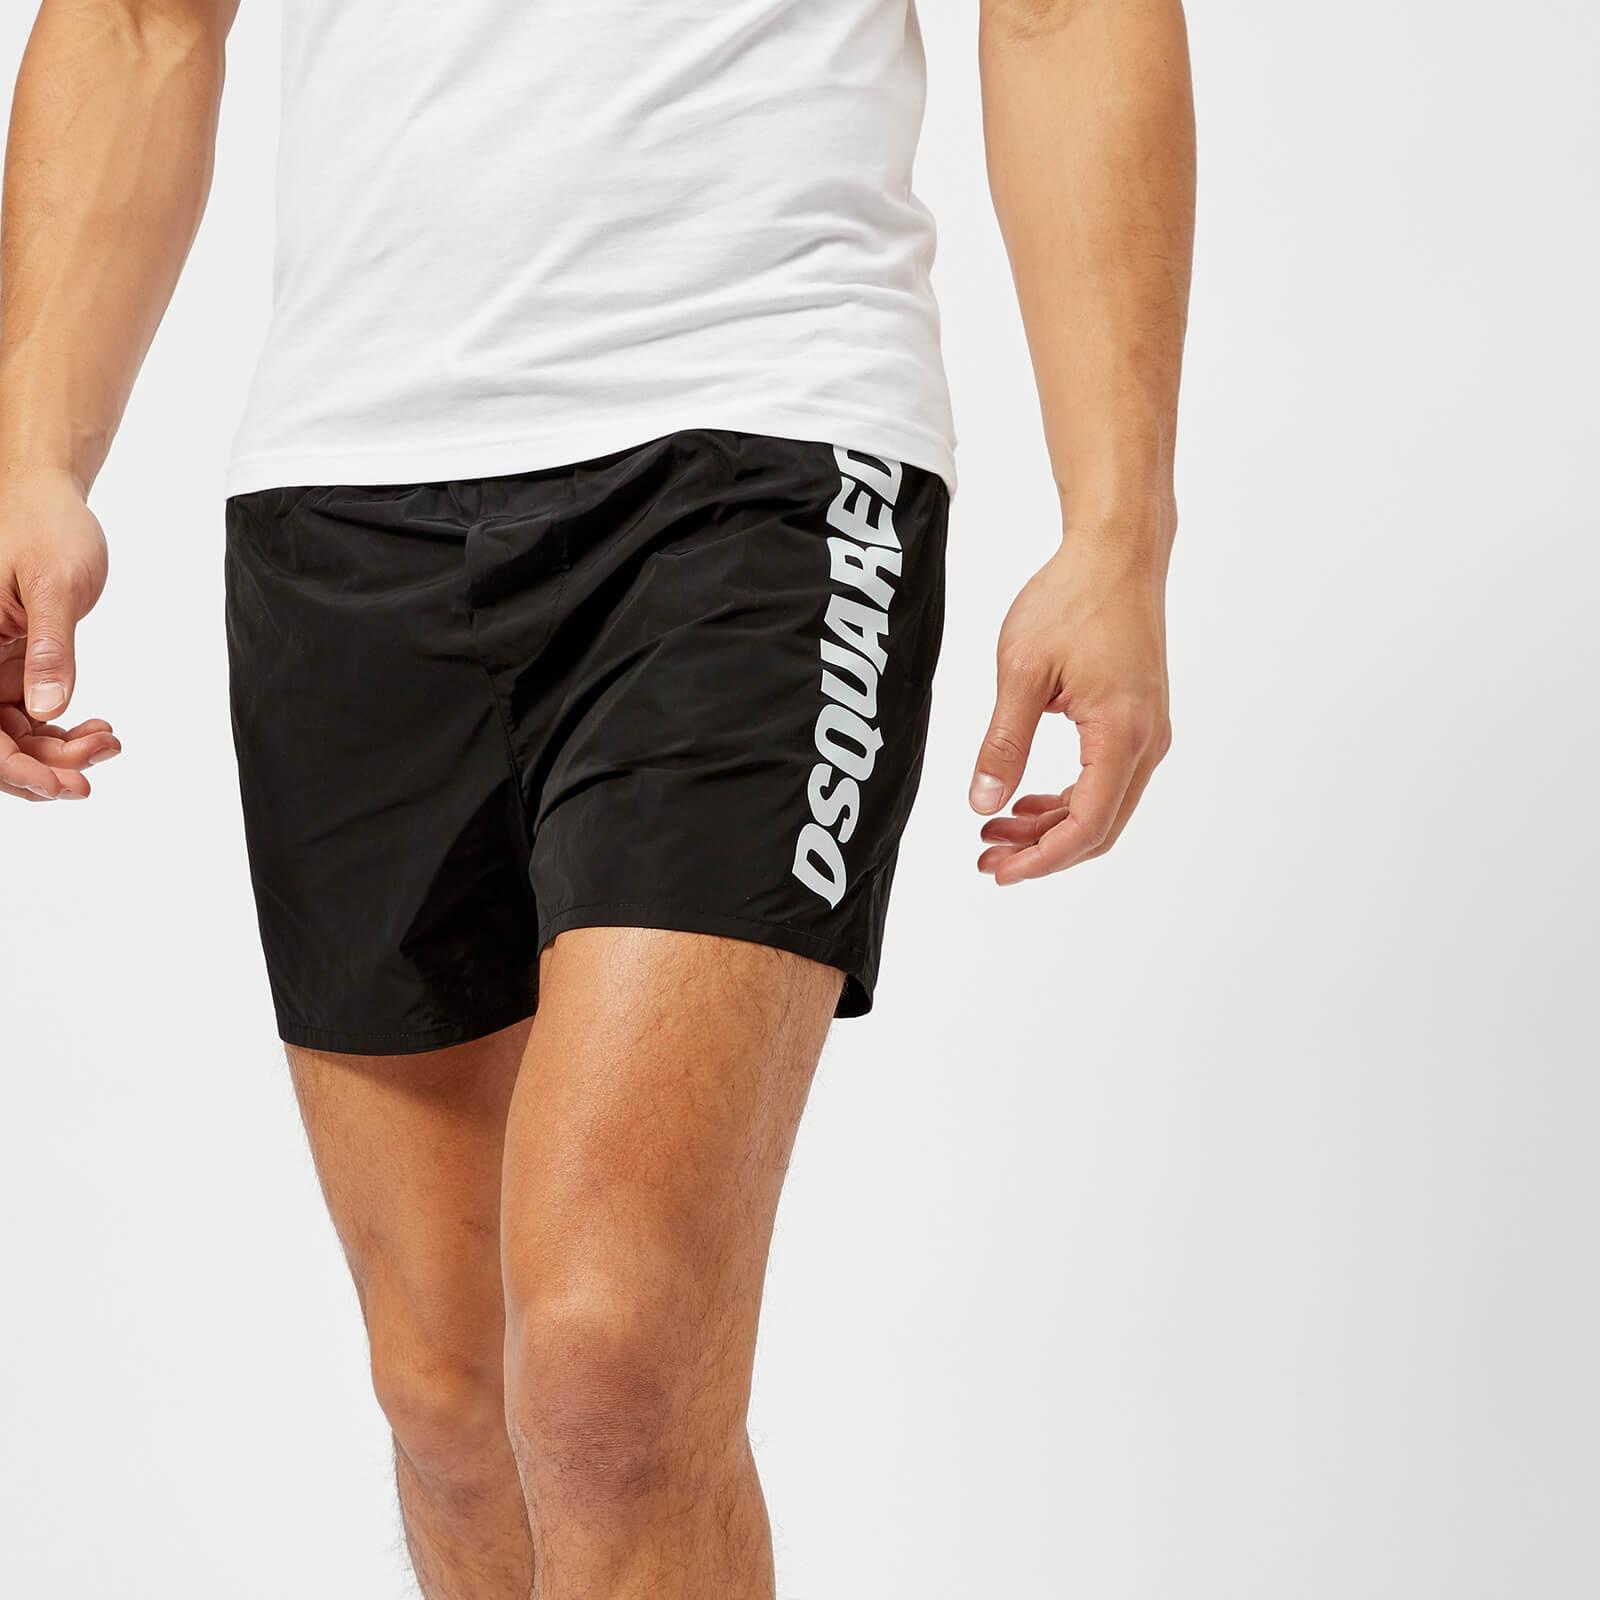 e06911a72a Dsquared2 Men's Logo Swim Shorts - Black - Free UK Delivery over £50